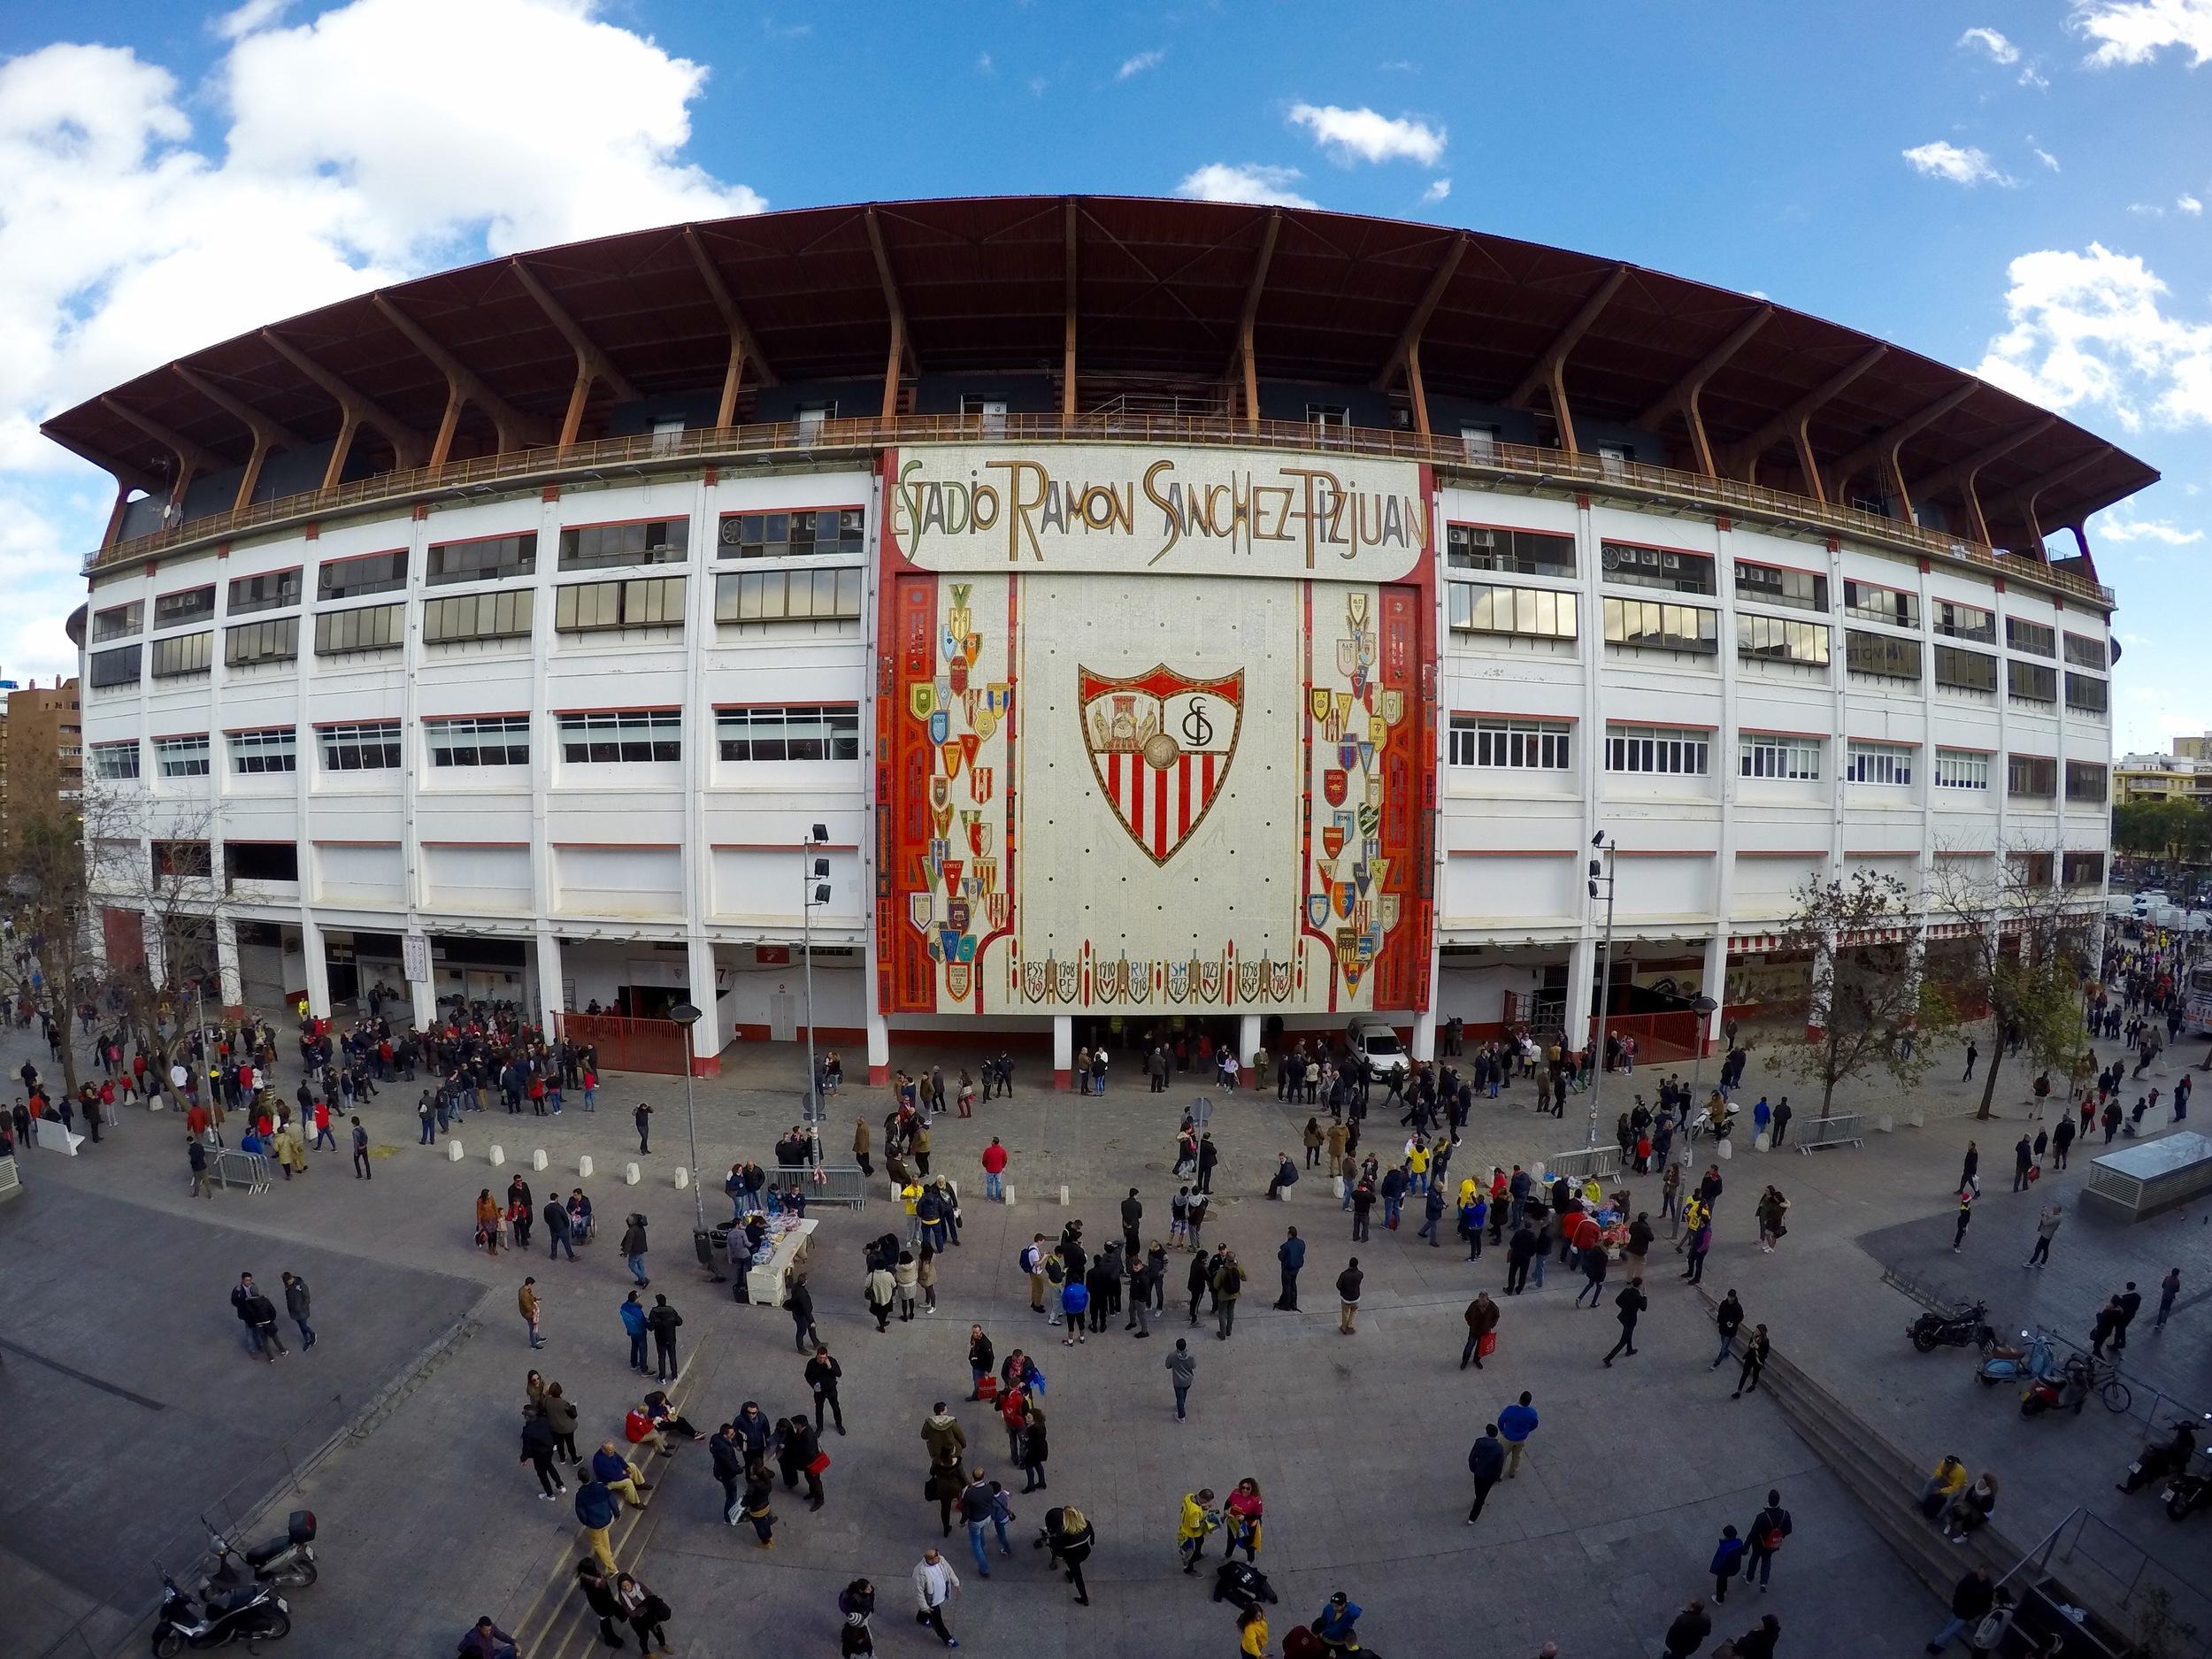 Ramon Sanchez Pizjuan Stadium, Seville FC, Seville, Andalucia, Spain, Europe | www.DoLessGetMoreDone.com |